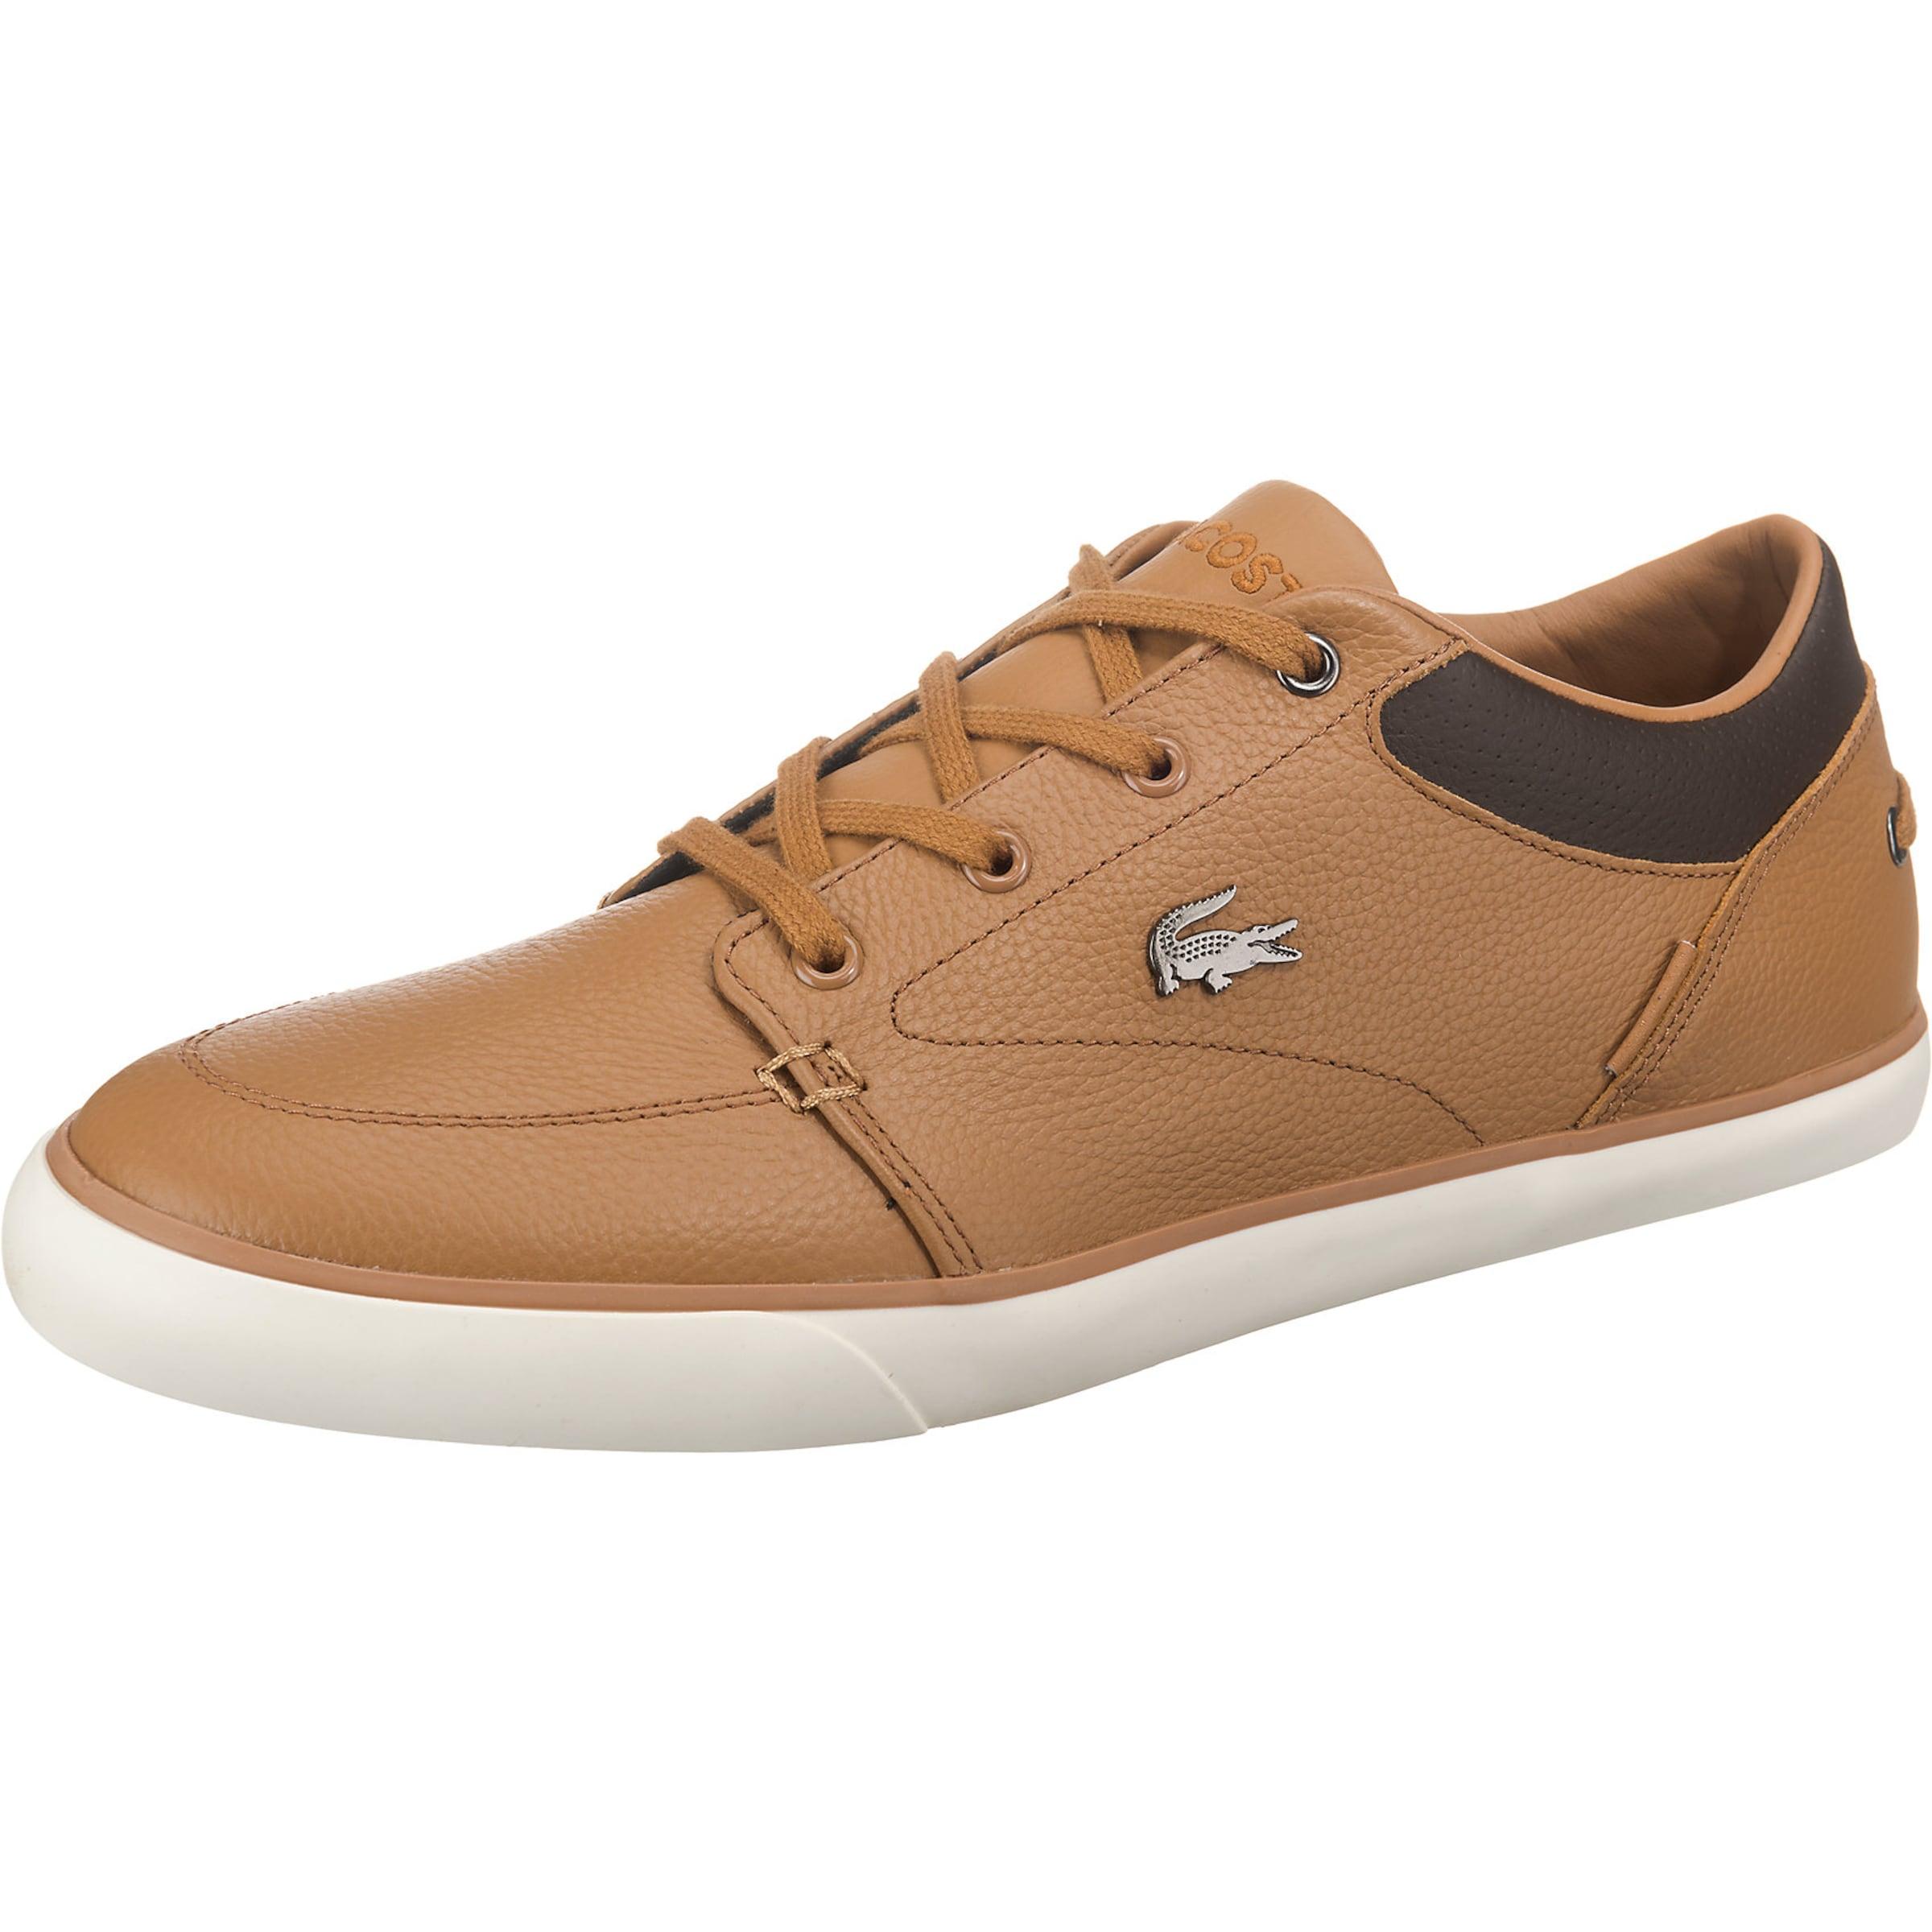 LACOSTE Sneaker Bayliss Vulc Verschleißfeste billige Schuhe